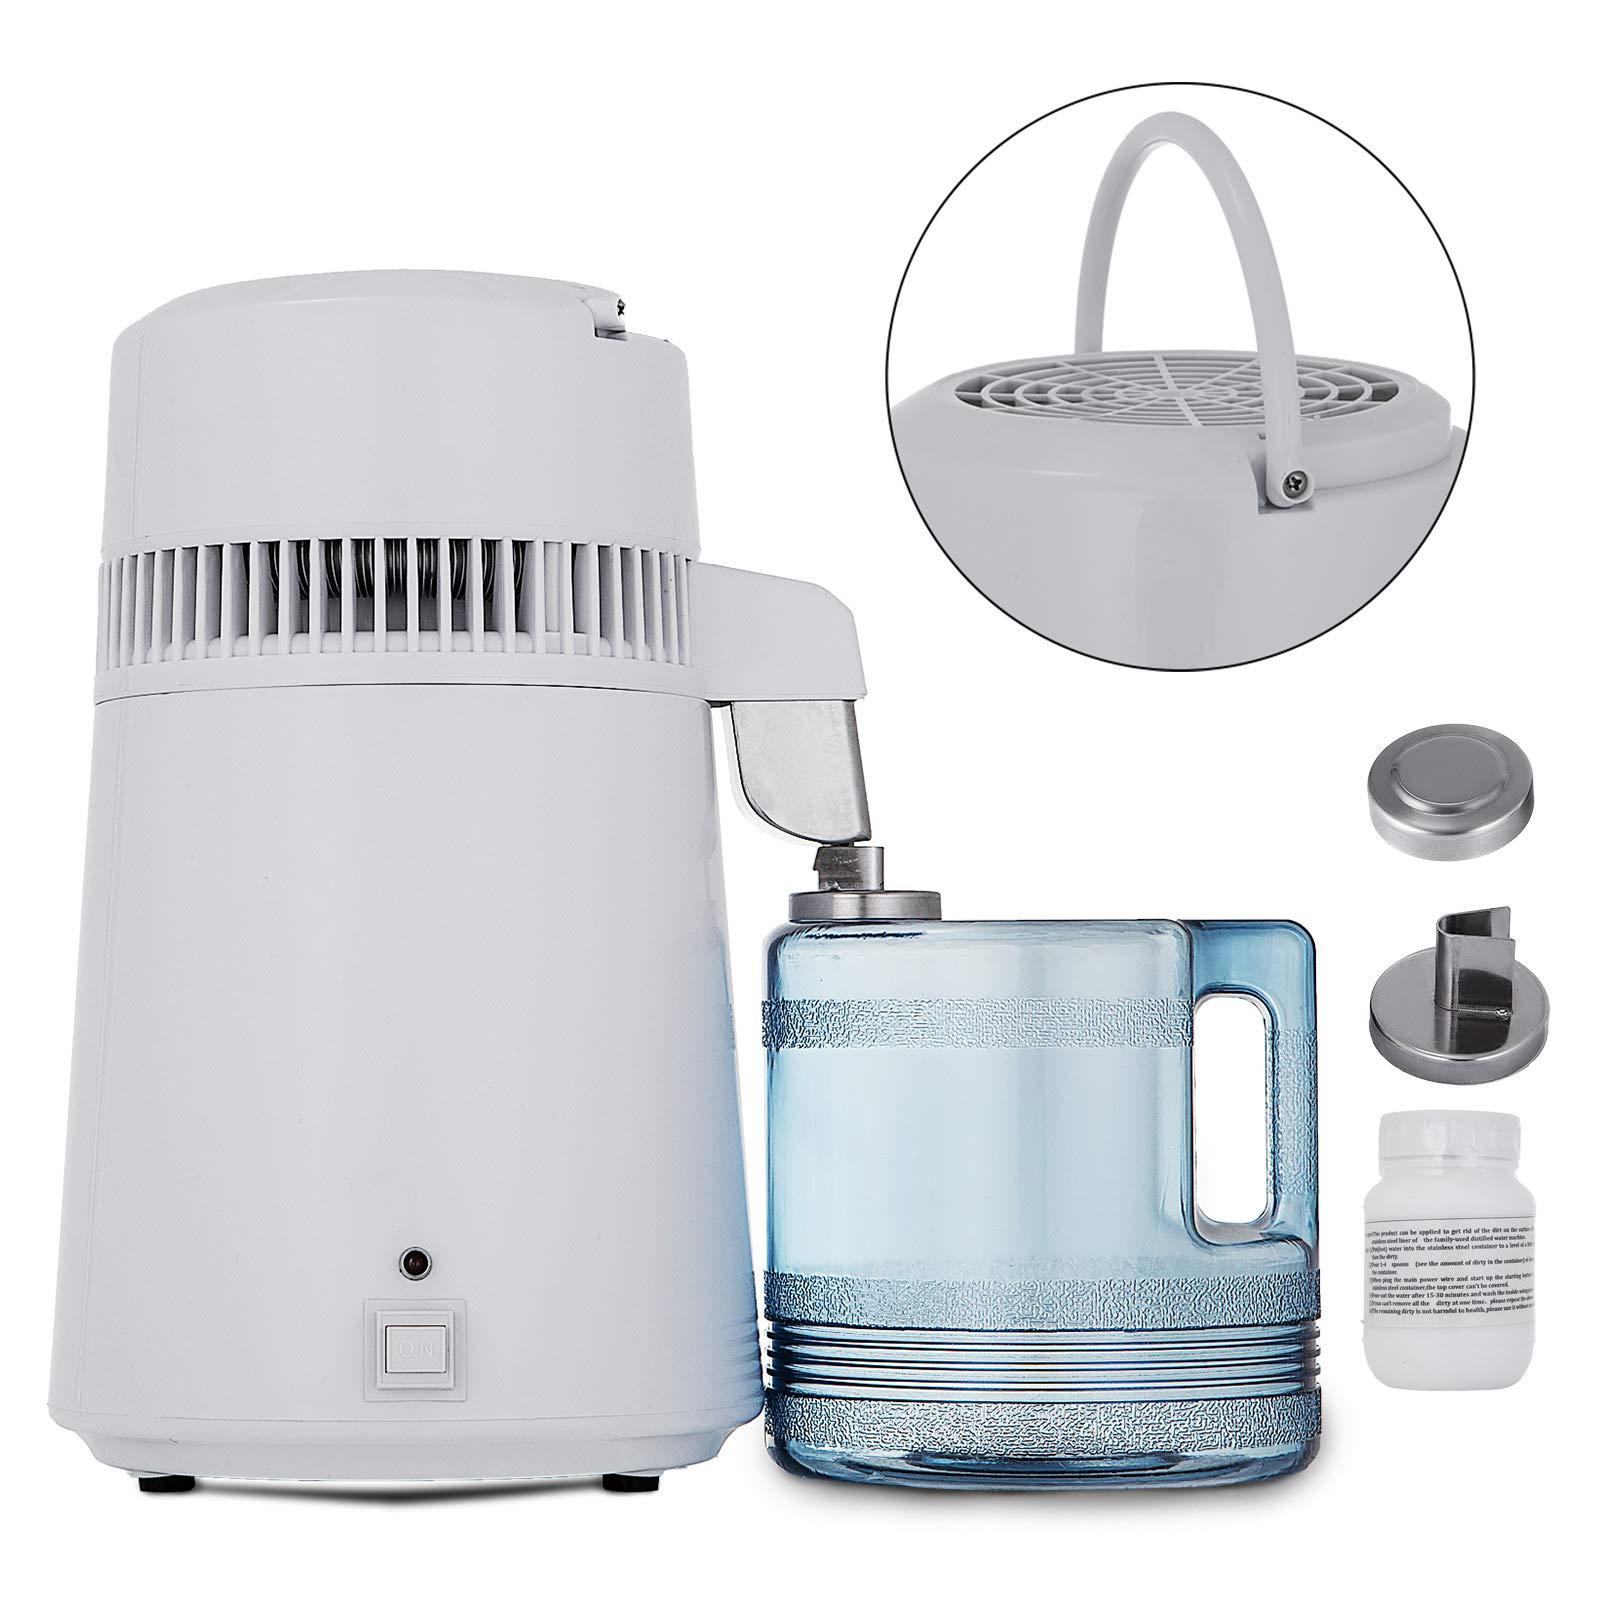 Amazon.com: Distiller Residue Cleaner 1lb.: Health & Personal Care